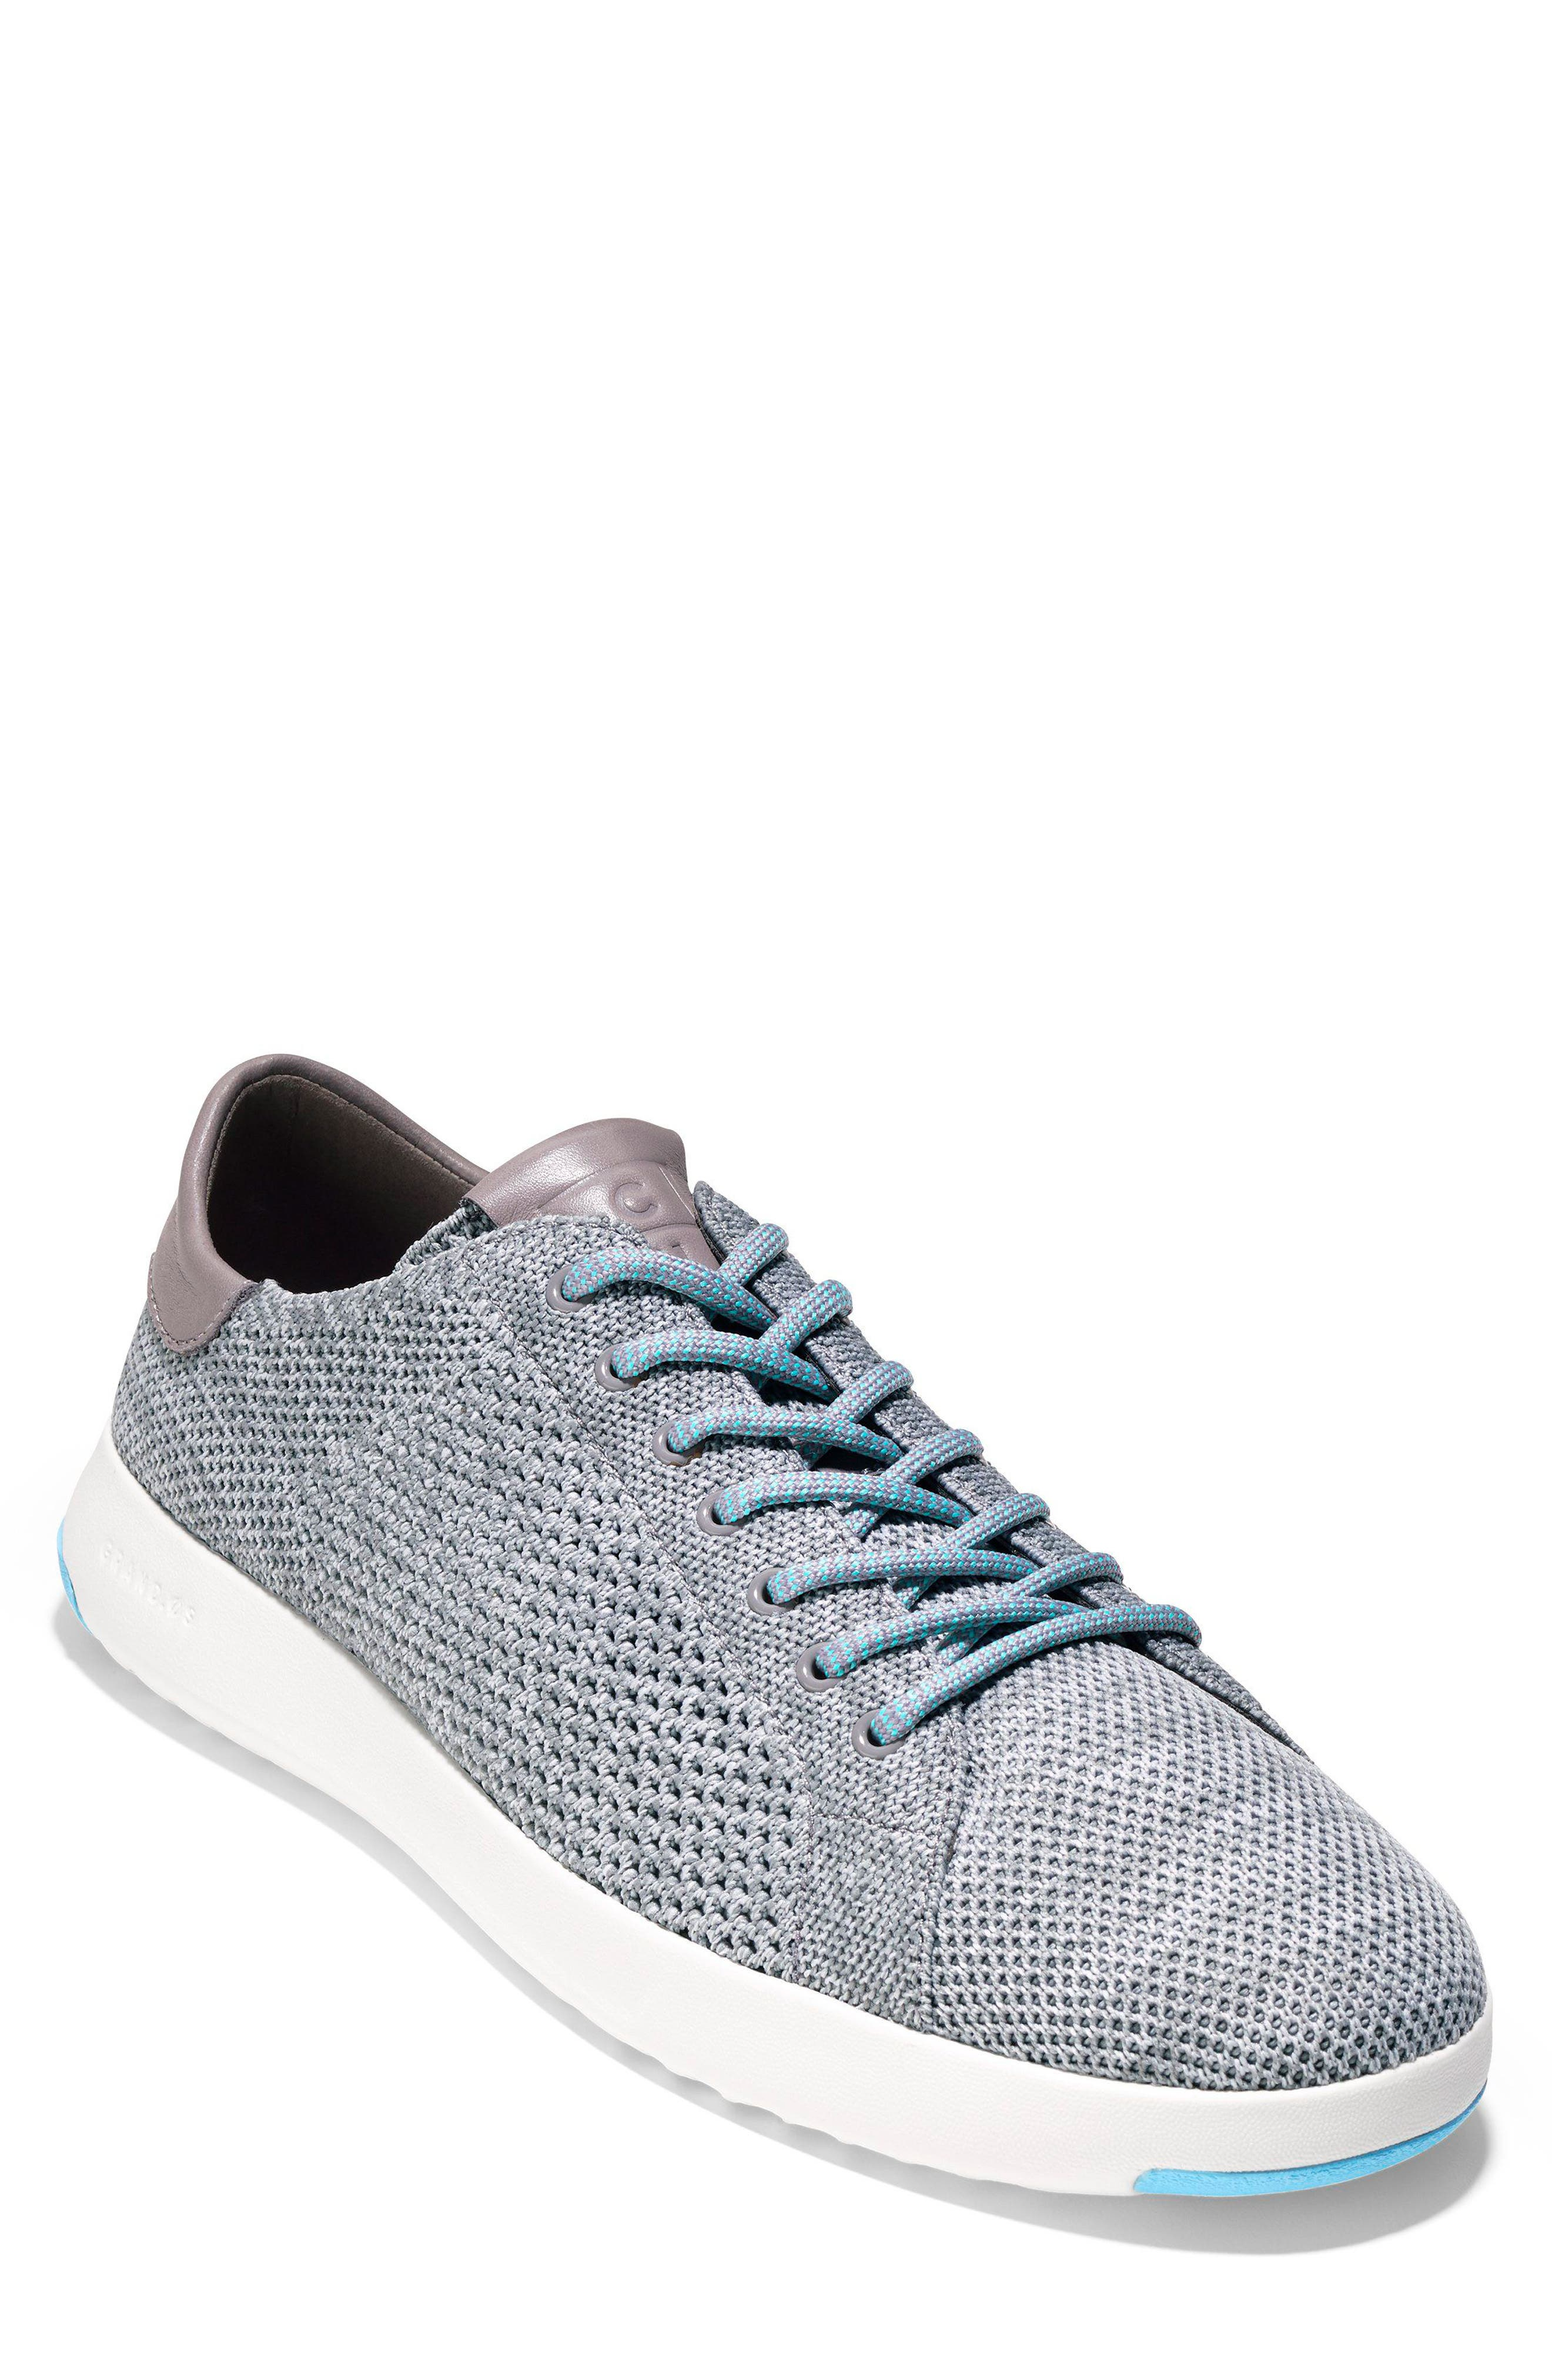 GrandPro Tennis Stitchlite Sneaker,                             Main thumbnail 1, color,